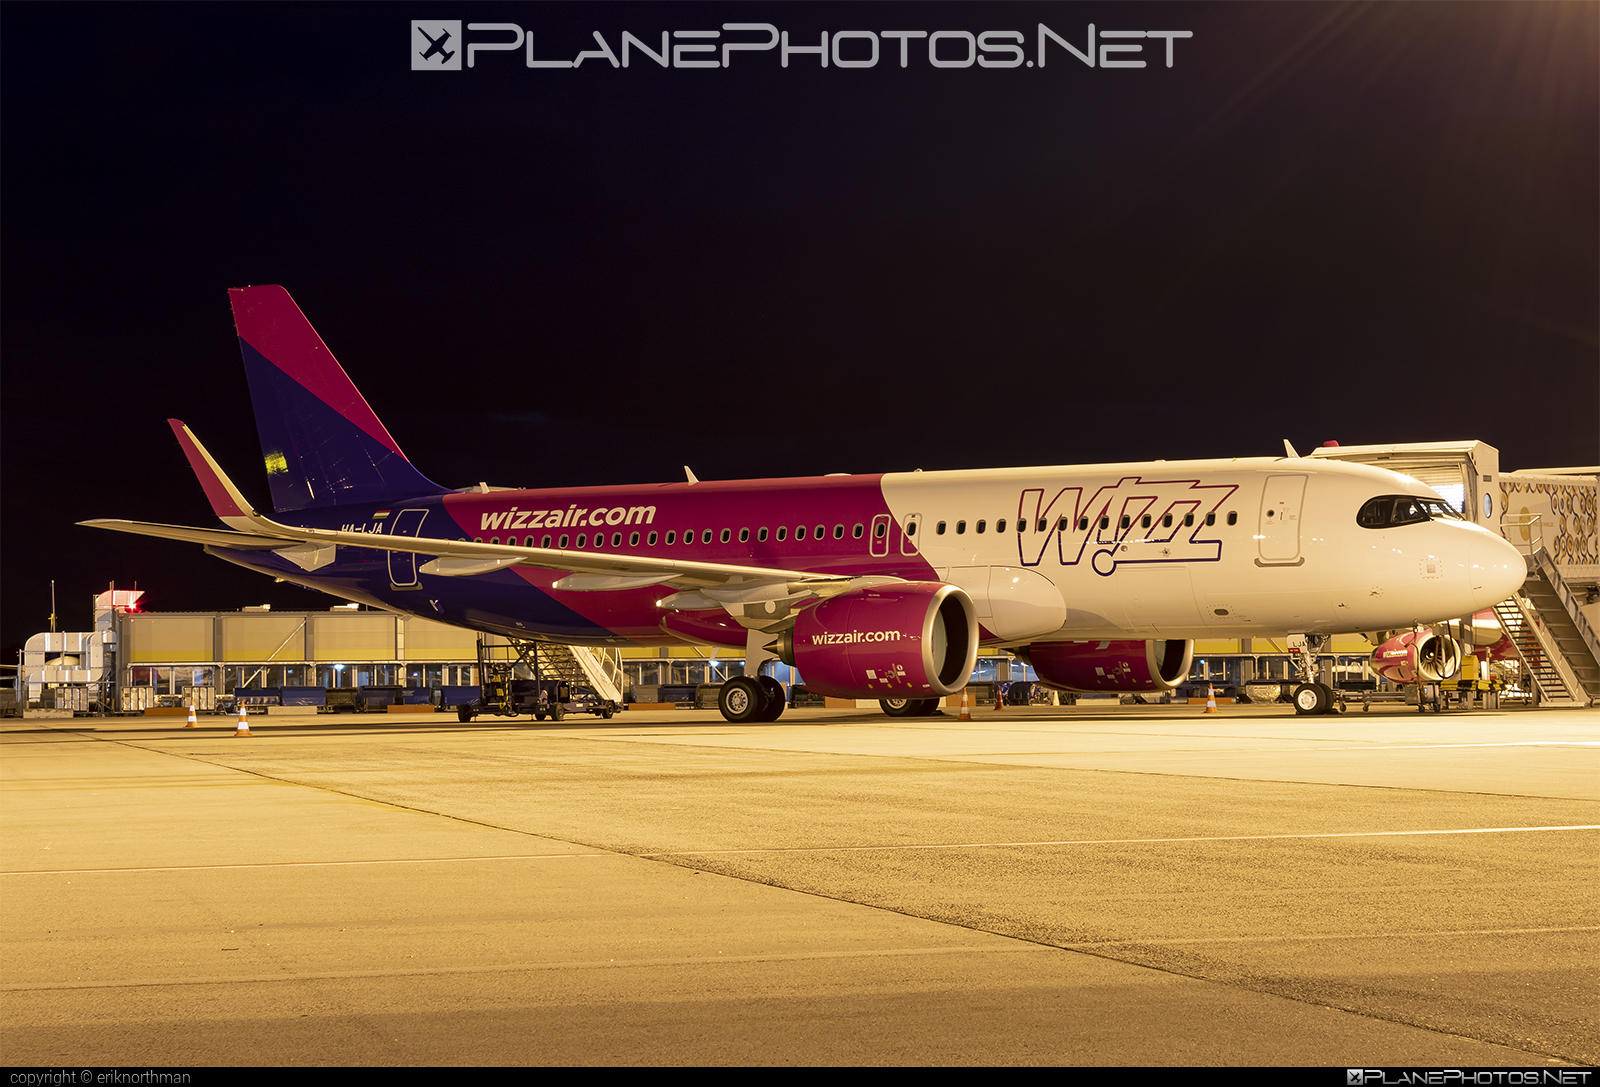 Ha Lja Airbus A320 271n Operated By Wizz Air Taken By Eriknorthman Photoid 23149 Planephotos Net